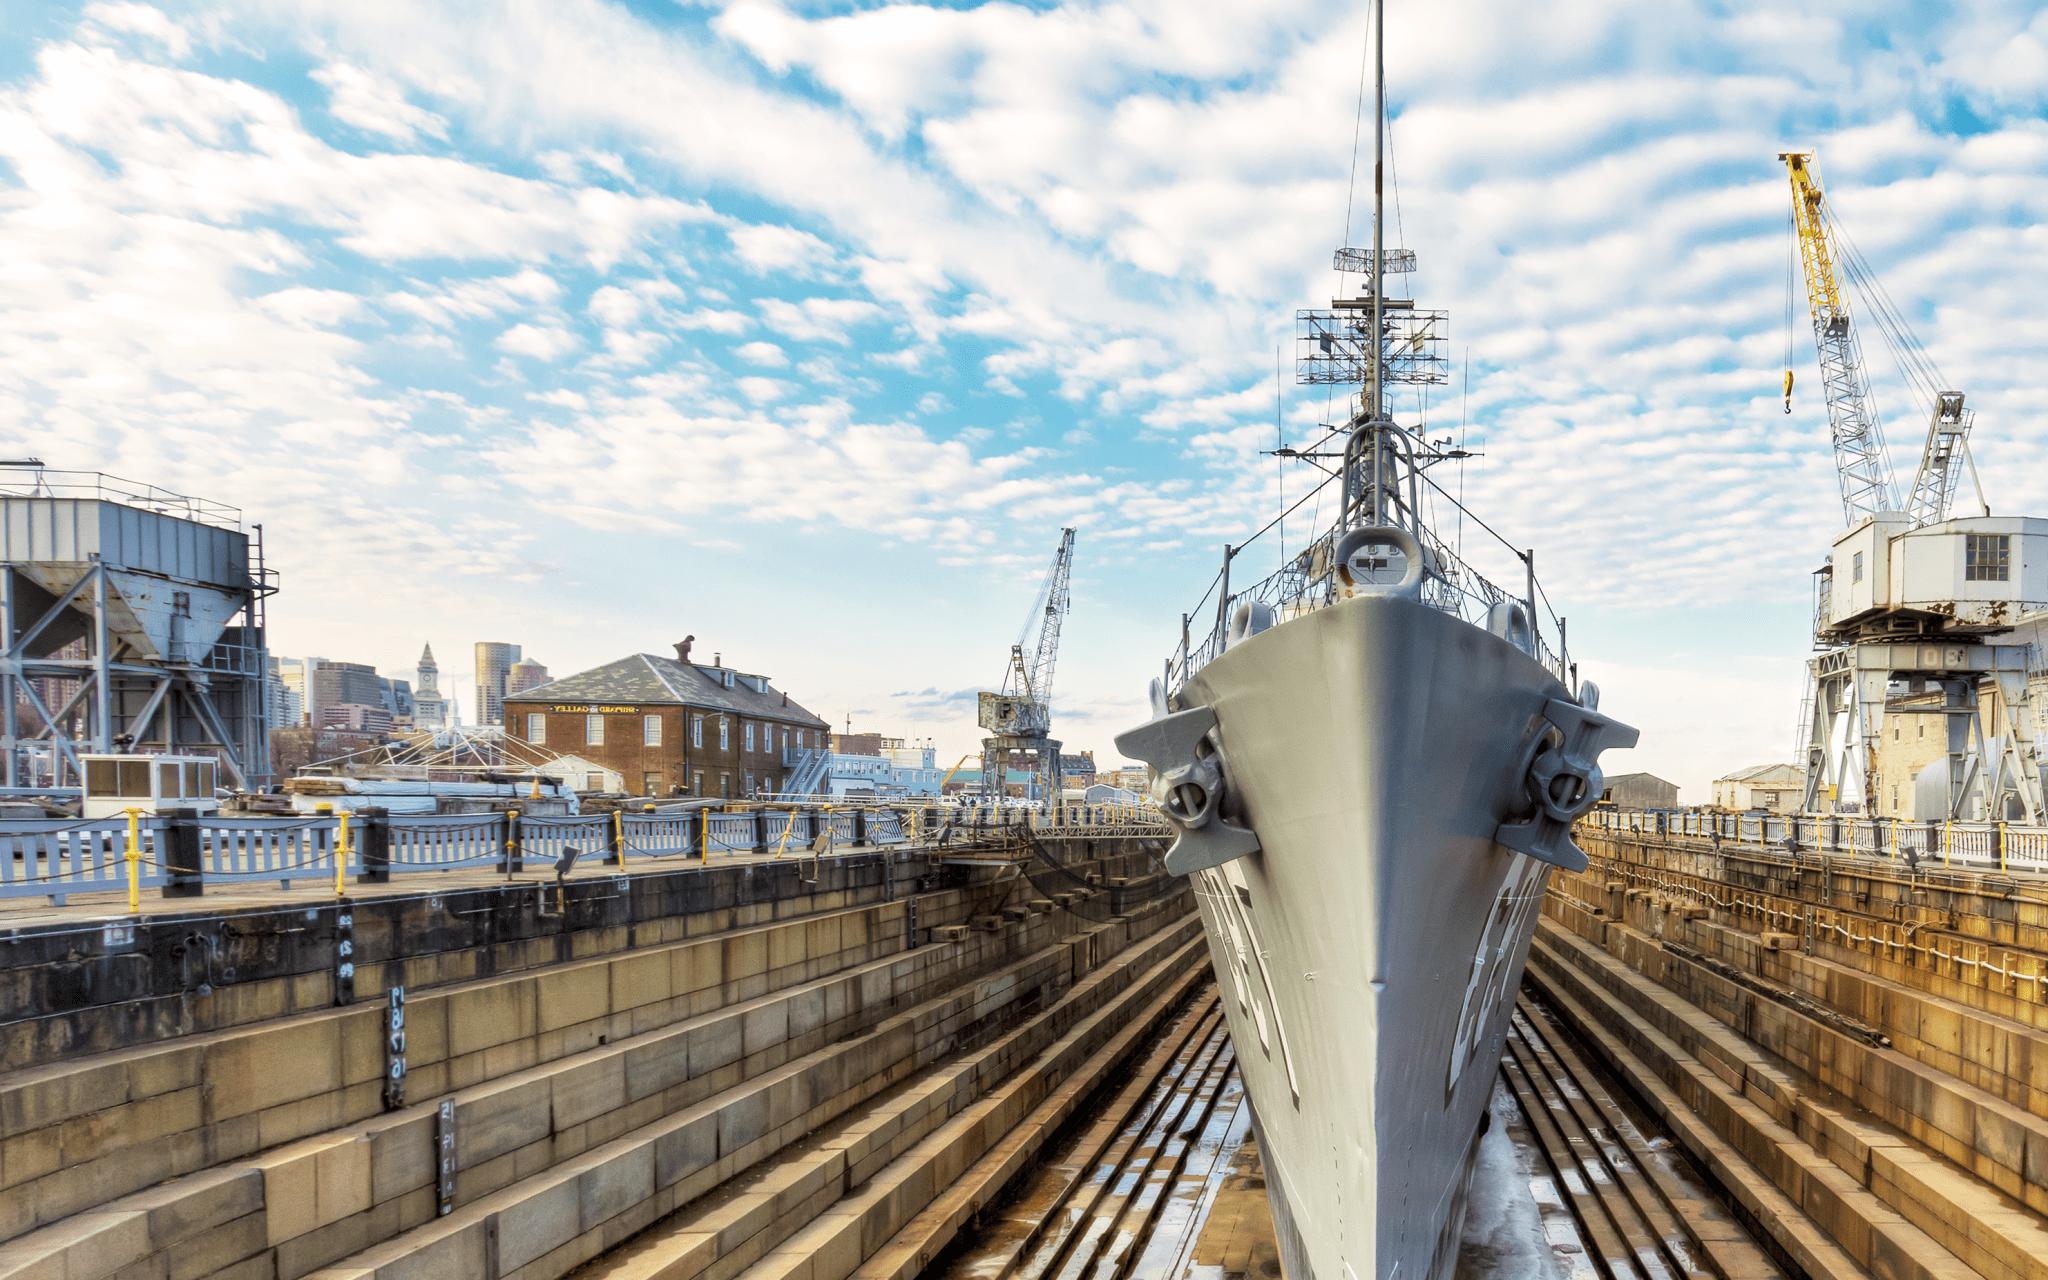 Naval ship sits in a boatyard.